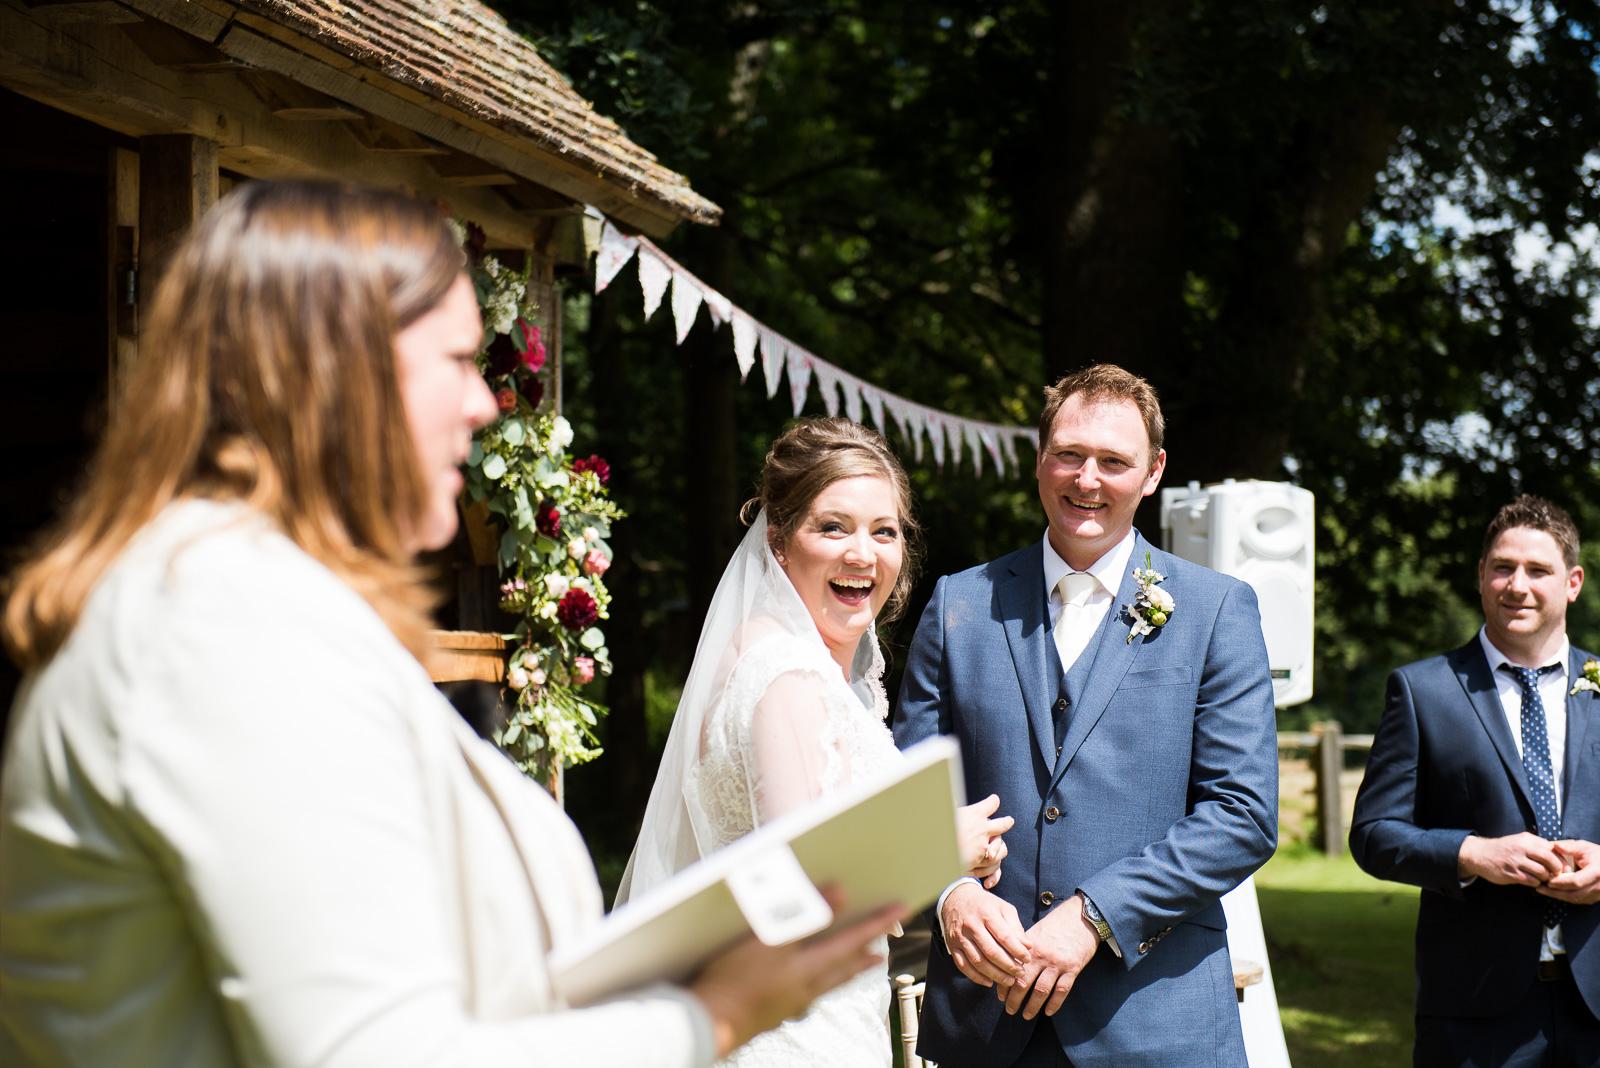 Wedding celebrant outdoor rustic summer wedding ceremony